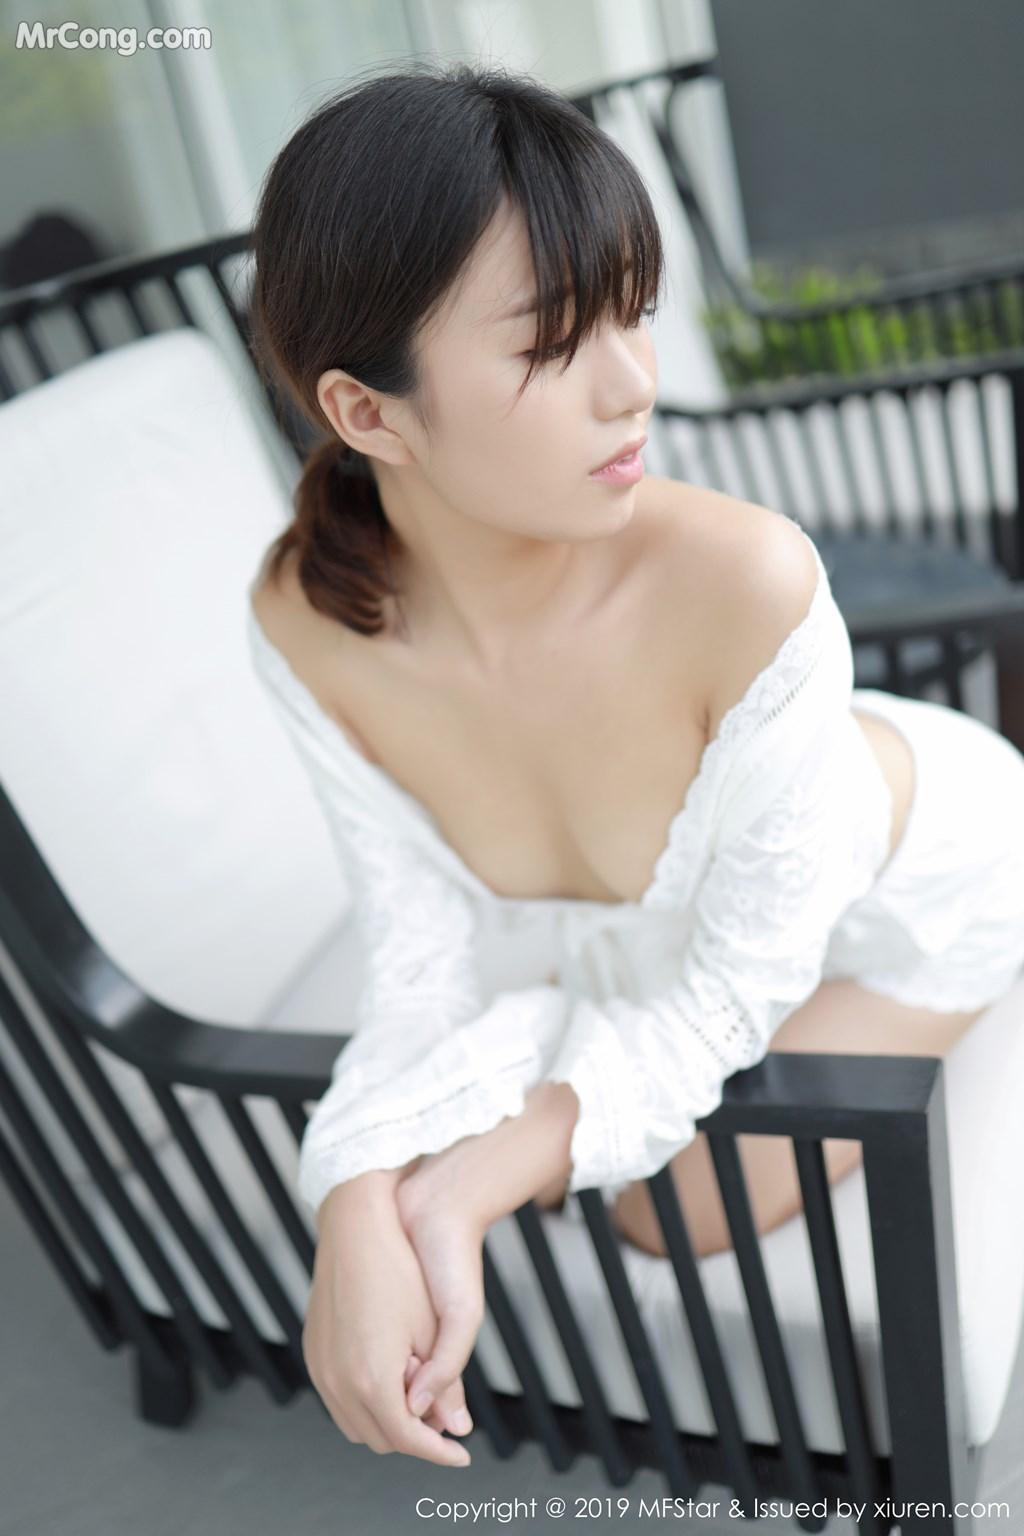 Image MFStar-Vol.192-Cang-Jing-You-Xiang-MrCong.com-009 in post MFStar Vol.192: Cang Jing You Xiang (仓井优香) (41 ảnh)